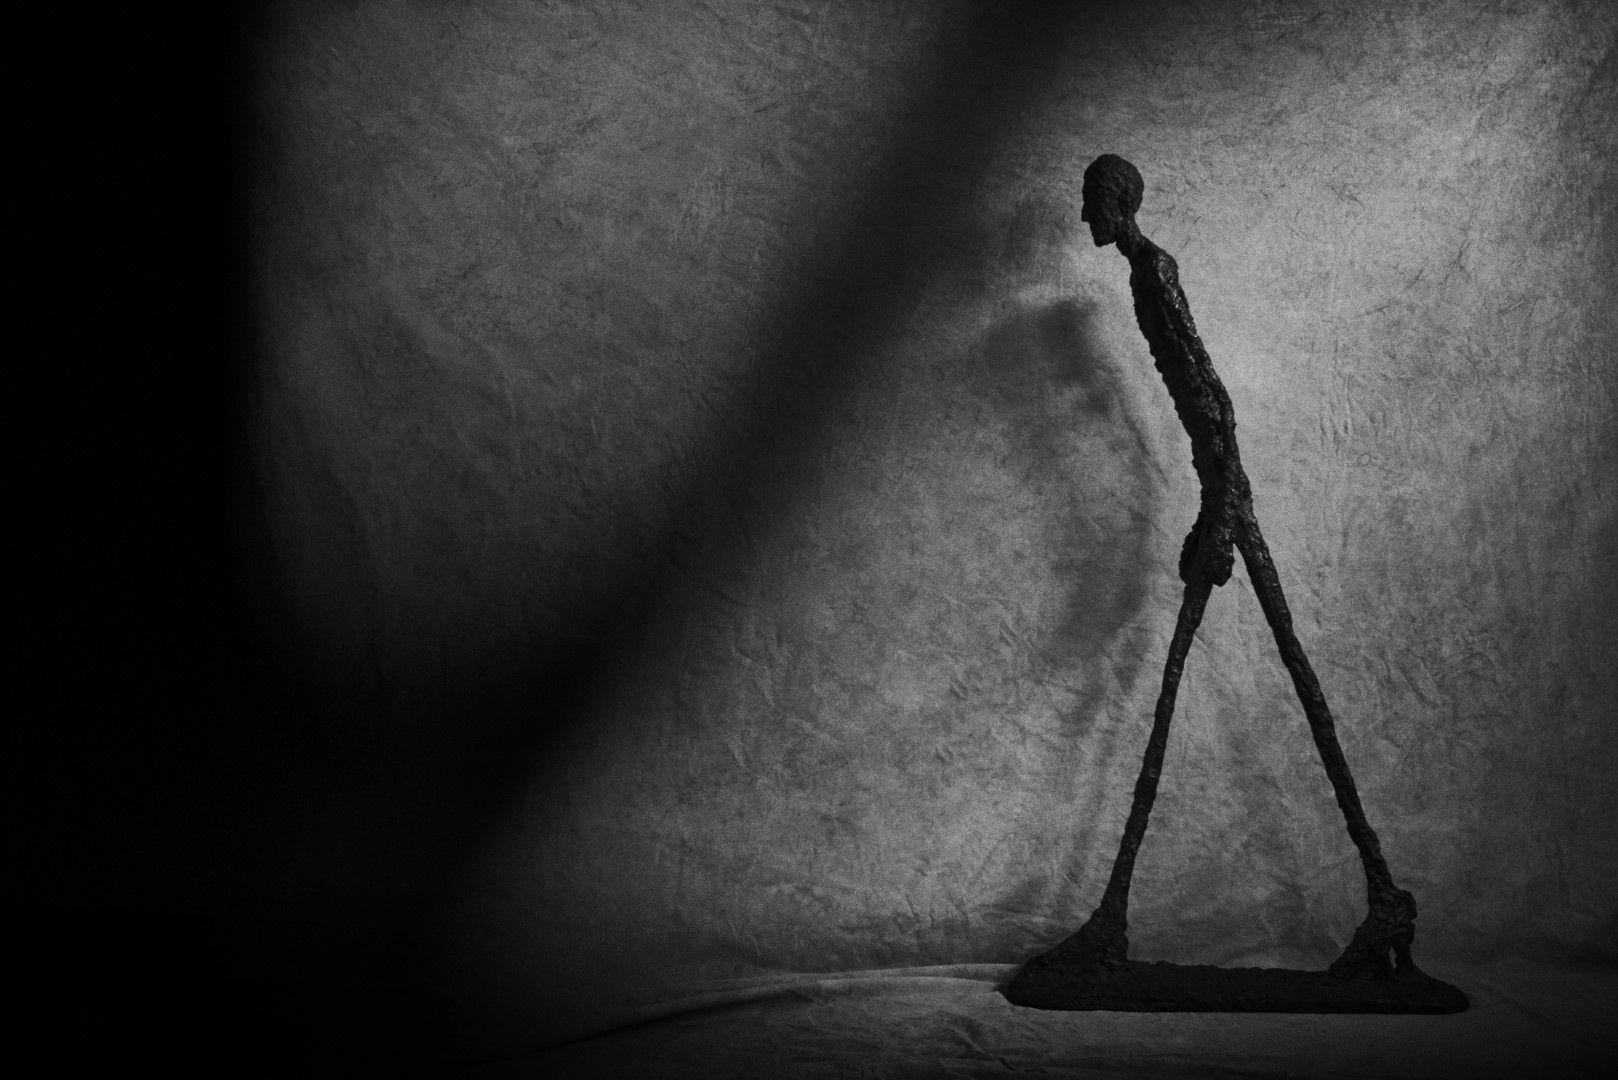 Ensaio. Giacometti-Lindbergh: fulgurações invisíveis do corpo sensível